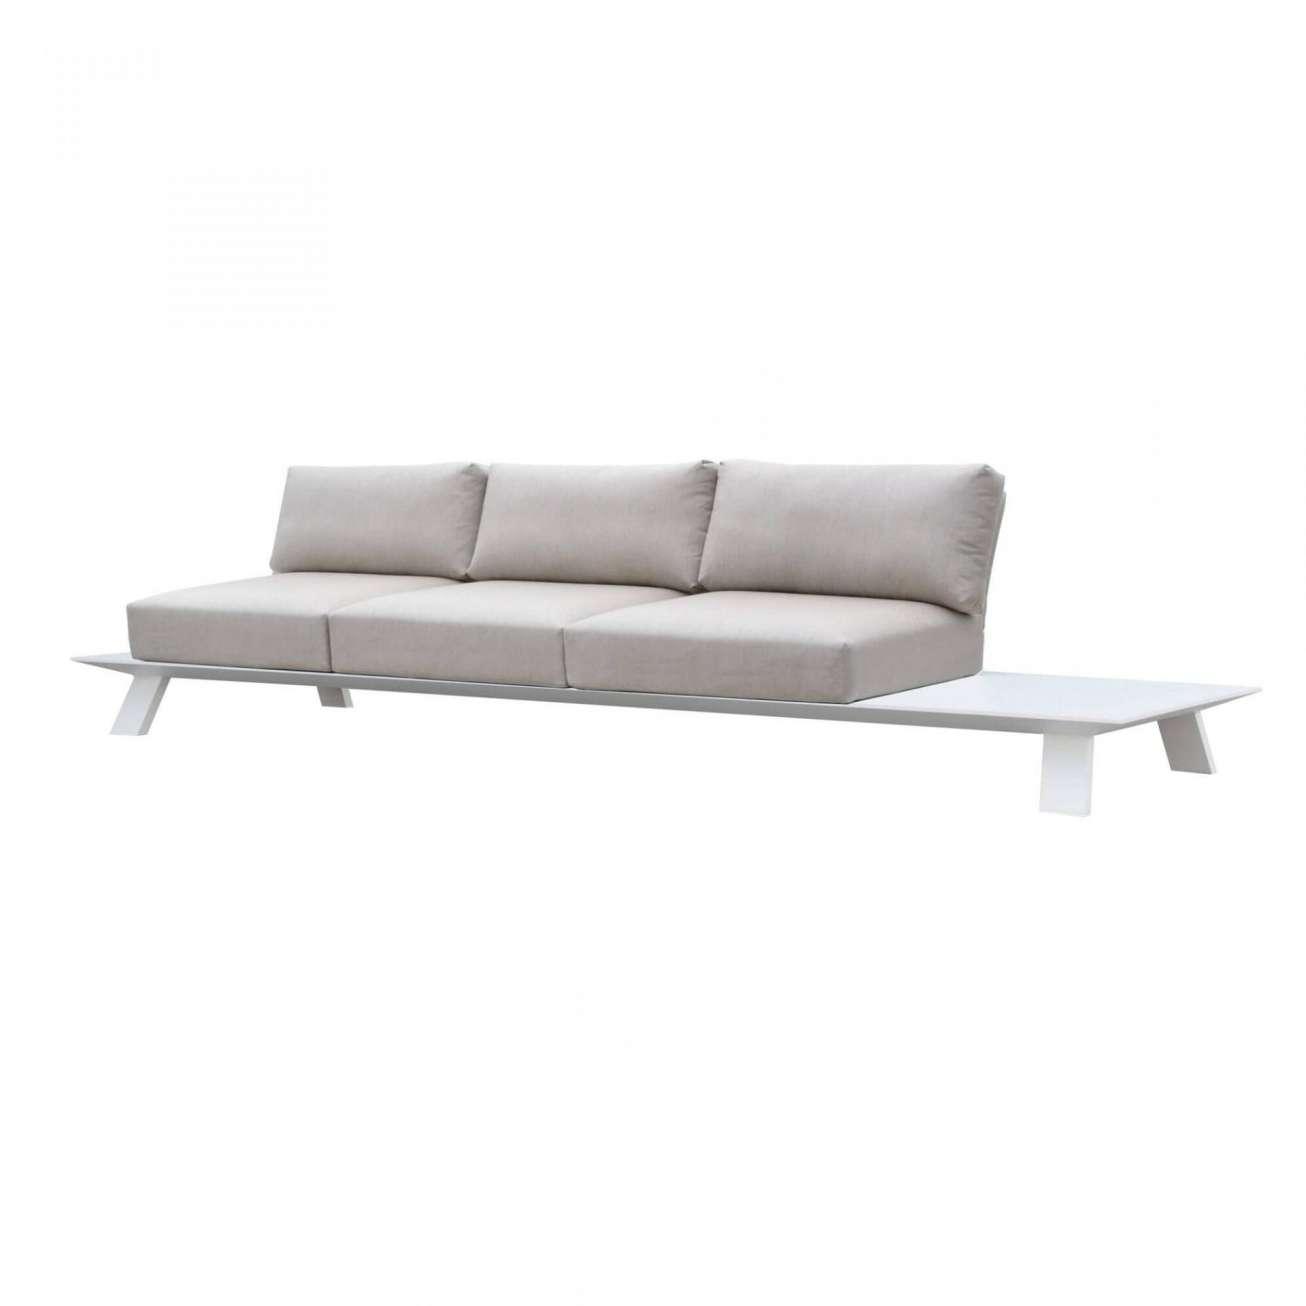 Gardenart ekslusiv treseter i hvit aluminium med sidebord